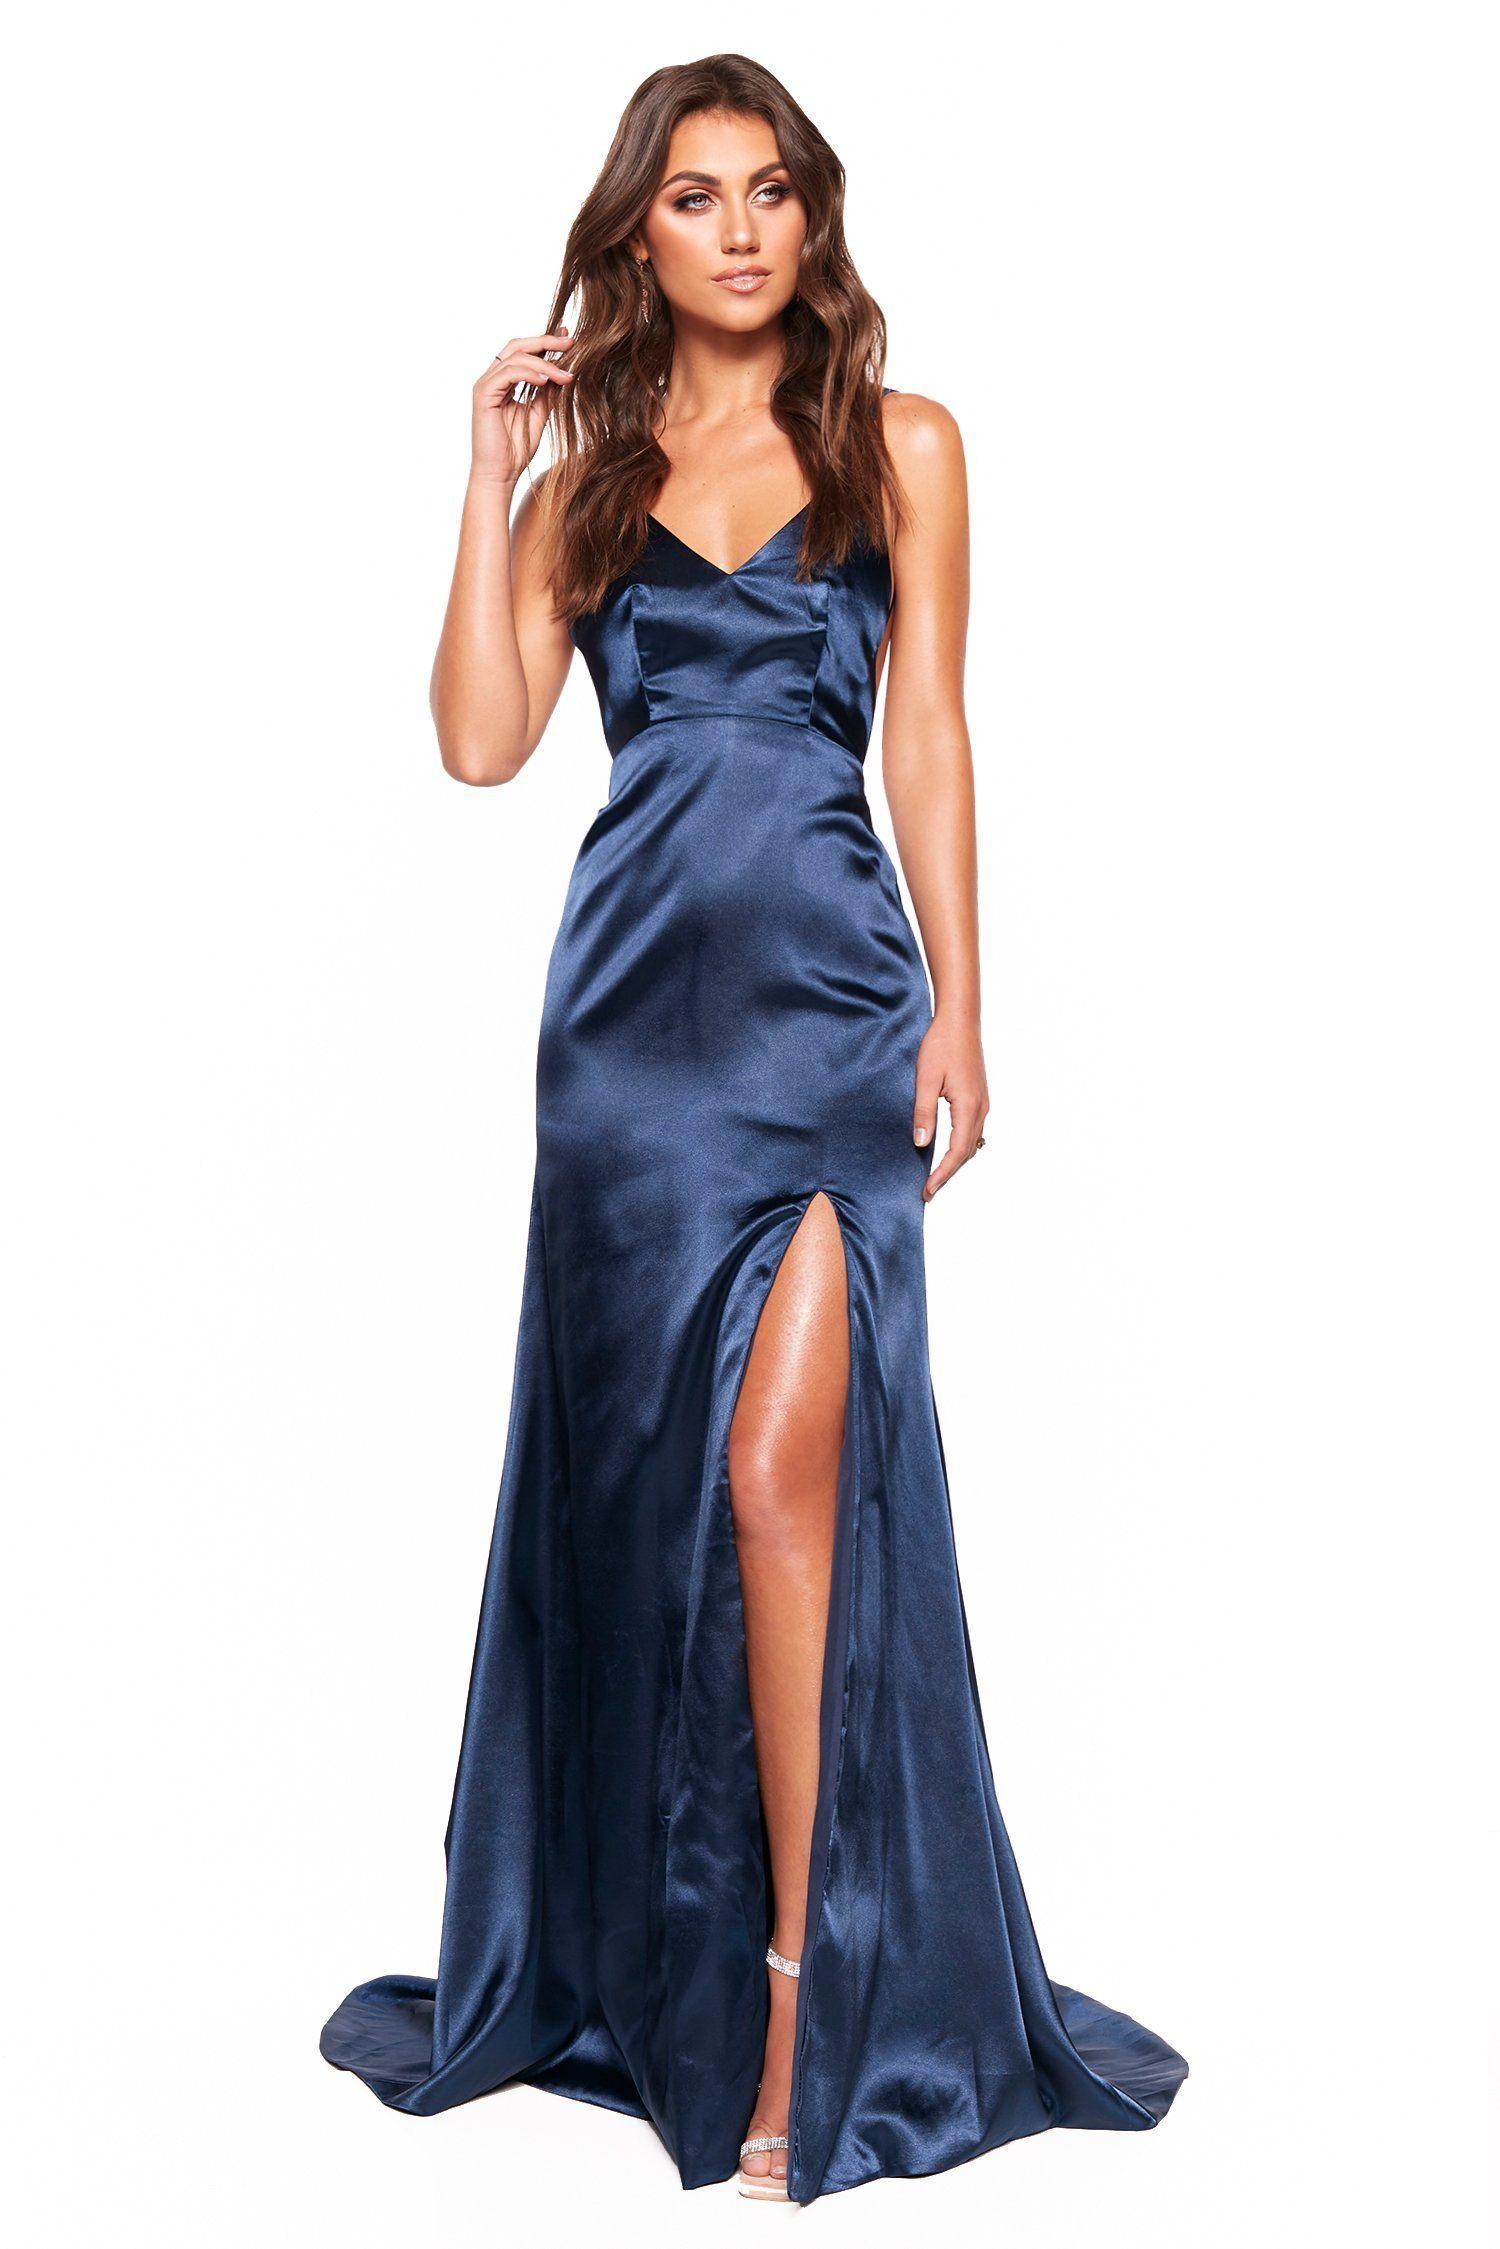 Navy Satin Prom Dress | Satin gown, Silk prom dress, Navy satin dress